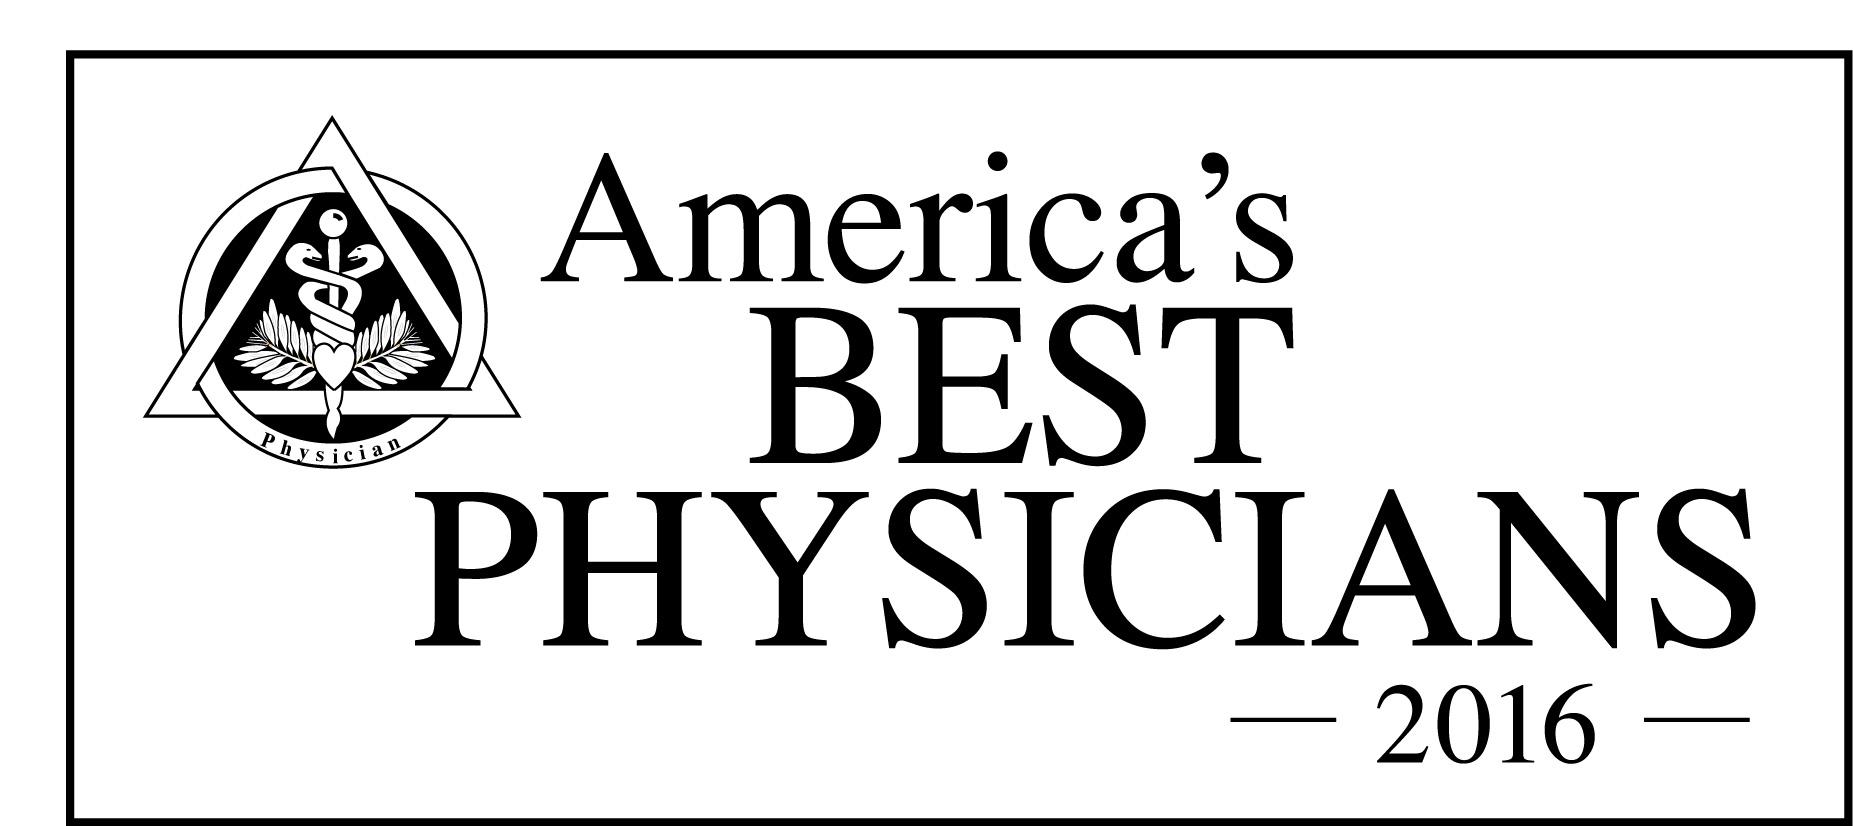 Physicians 2016 Logo Rect.jpg